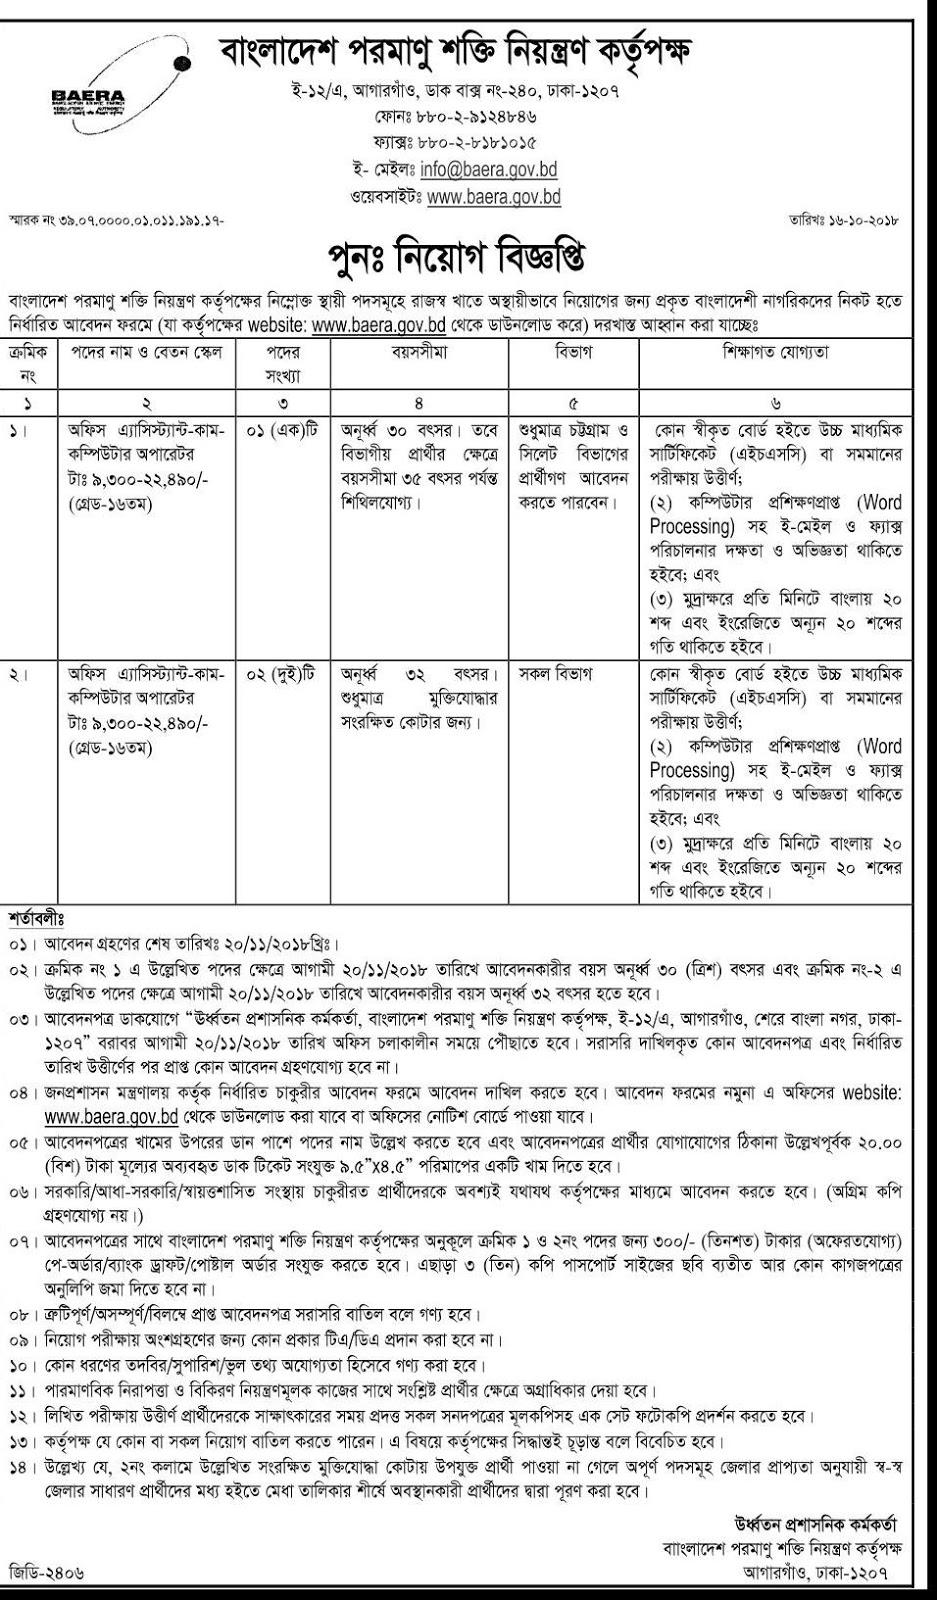 Bangladesh Atomic Energy Regulatory Authority (BAERA) Job Circular  2018